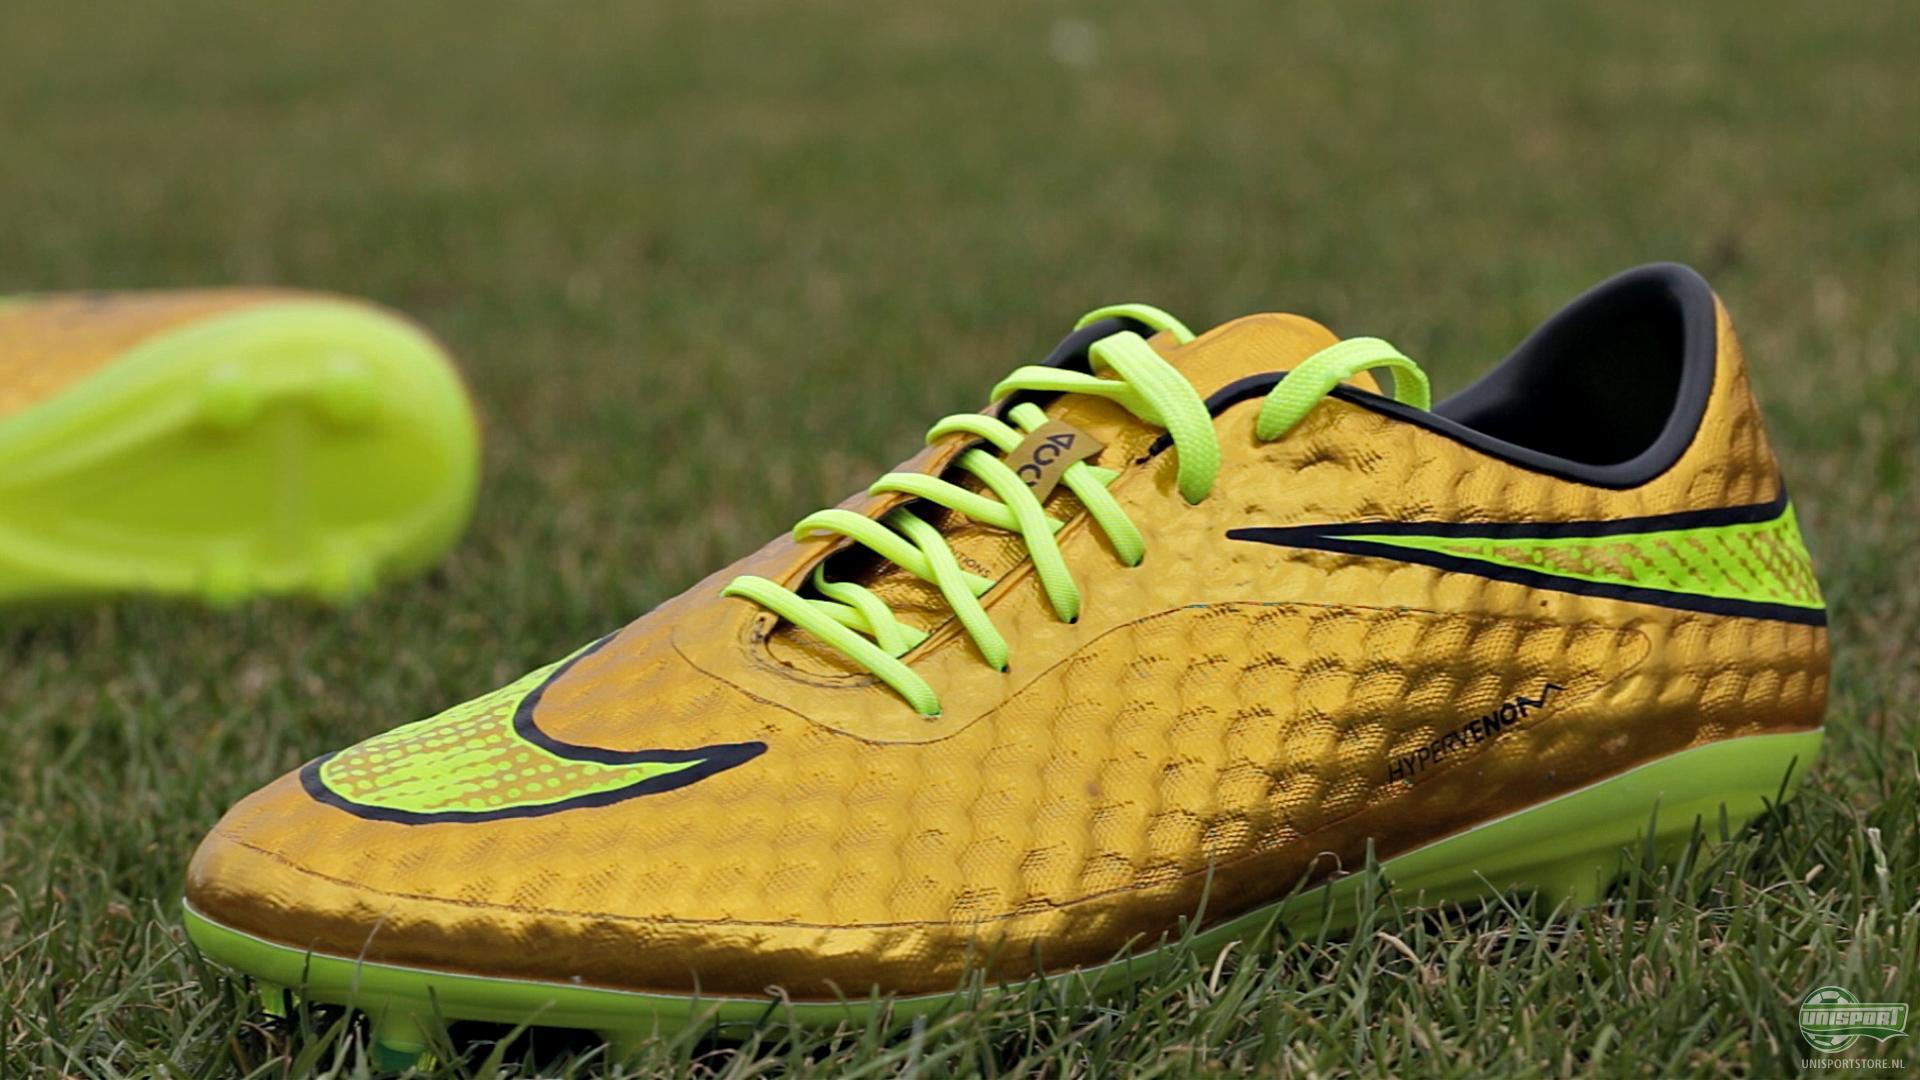 Nike Voetbalschoenen Neymar